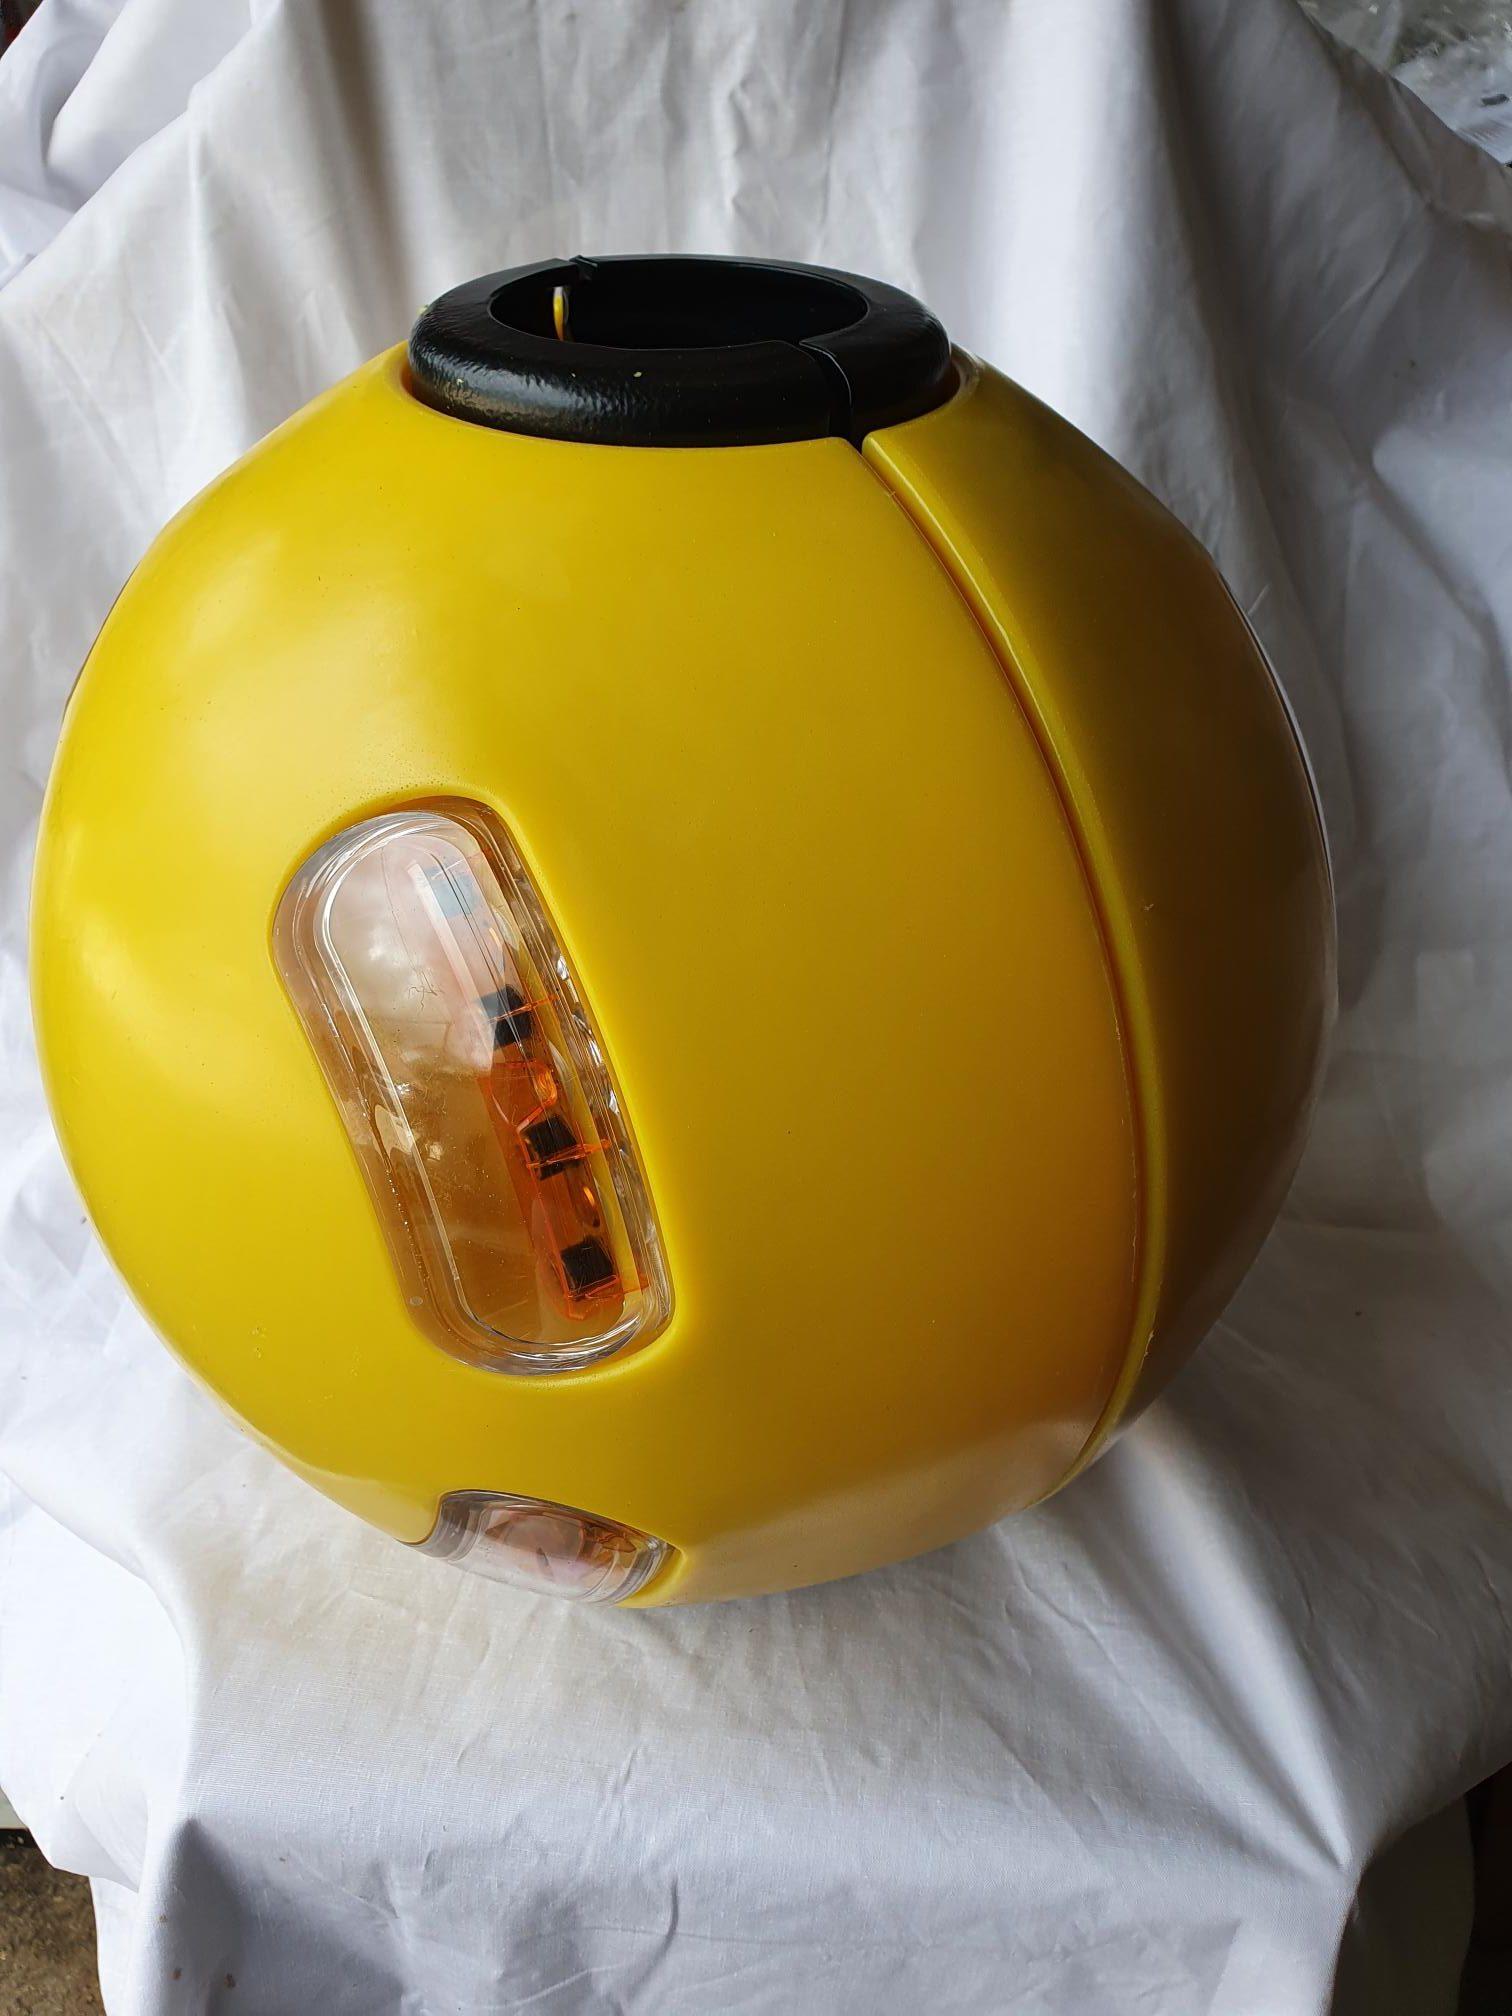 Simmonsigns Midustar LED Post Mounting Belisha Beacon